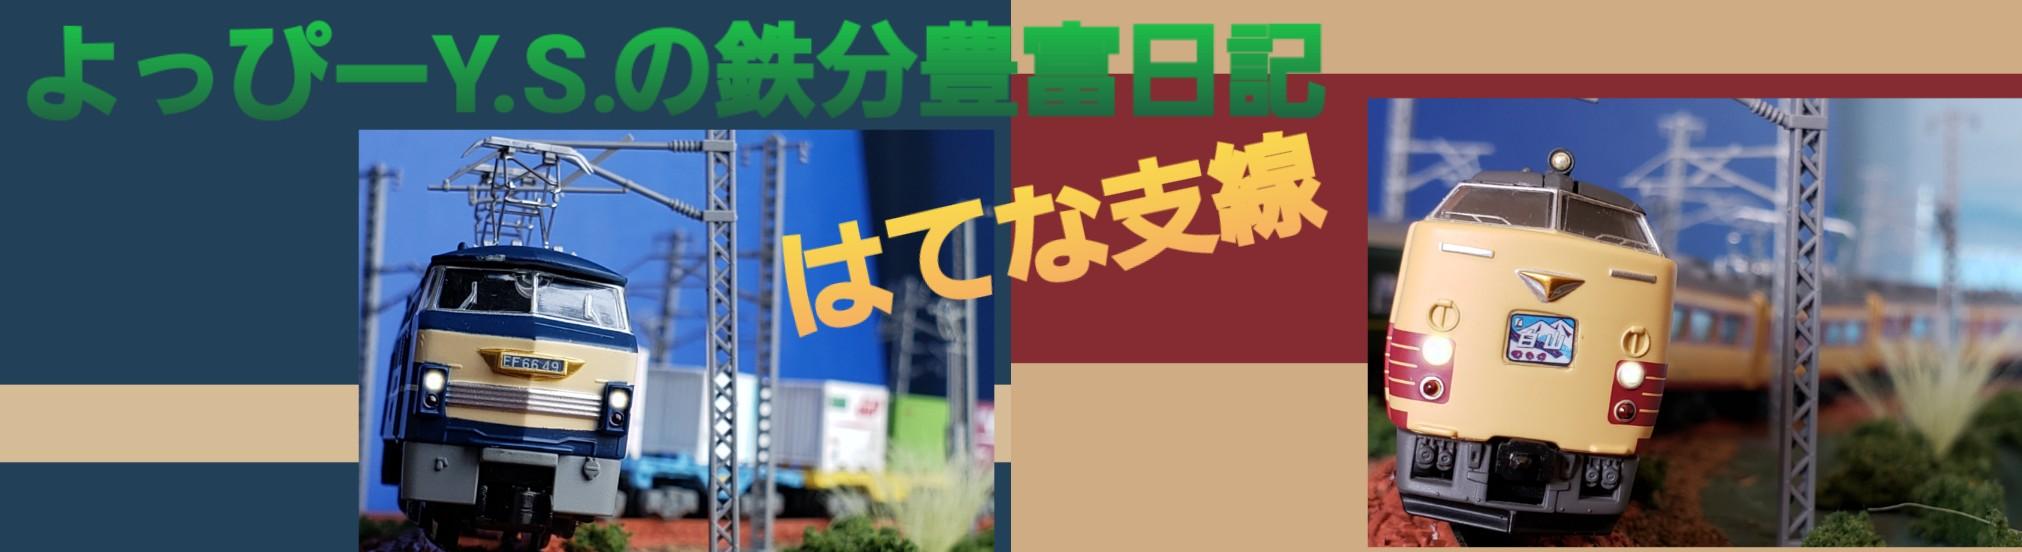 f:id:KAKOGAWA-YS:20200625201938j:image